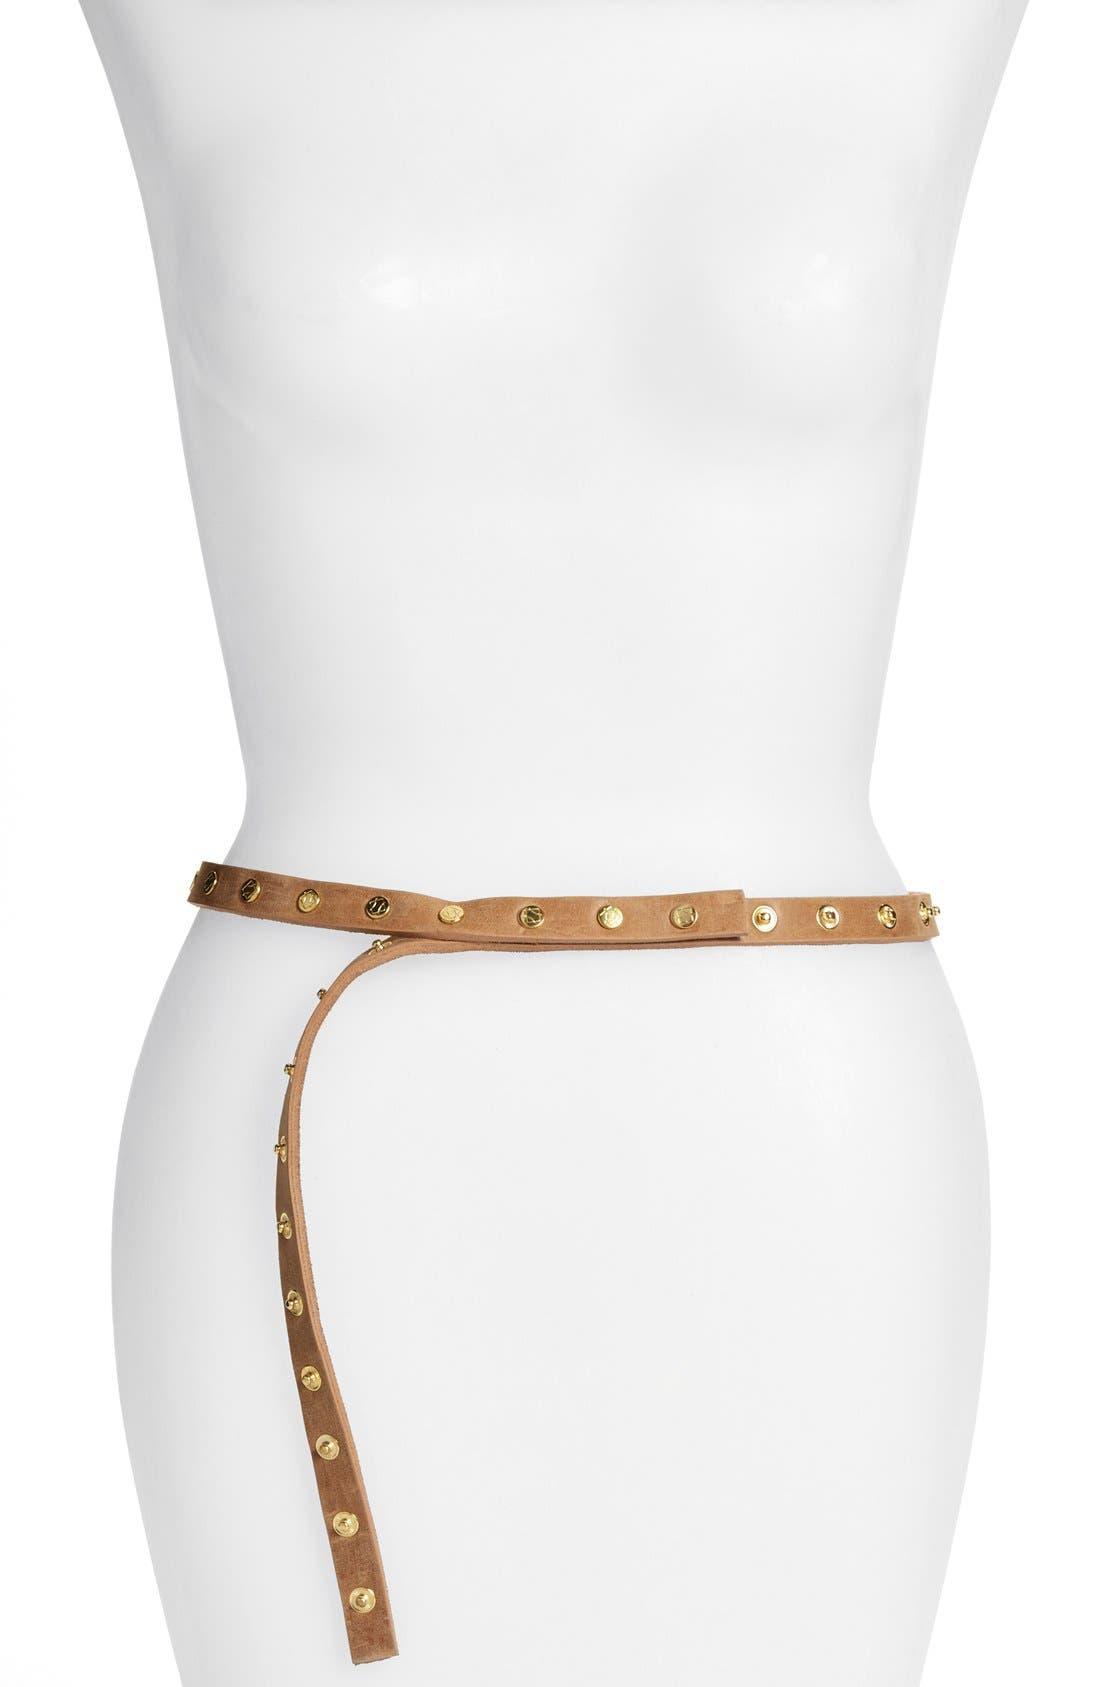 ADA 'Cala' Studded Skinny Leather Belt in Tan